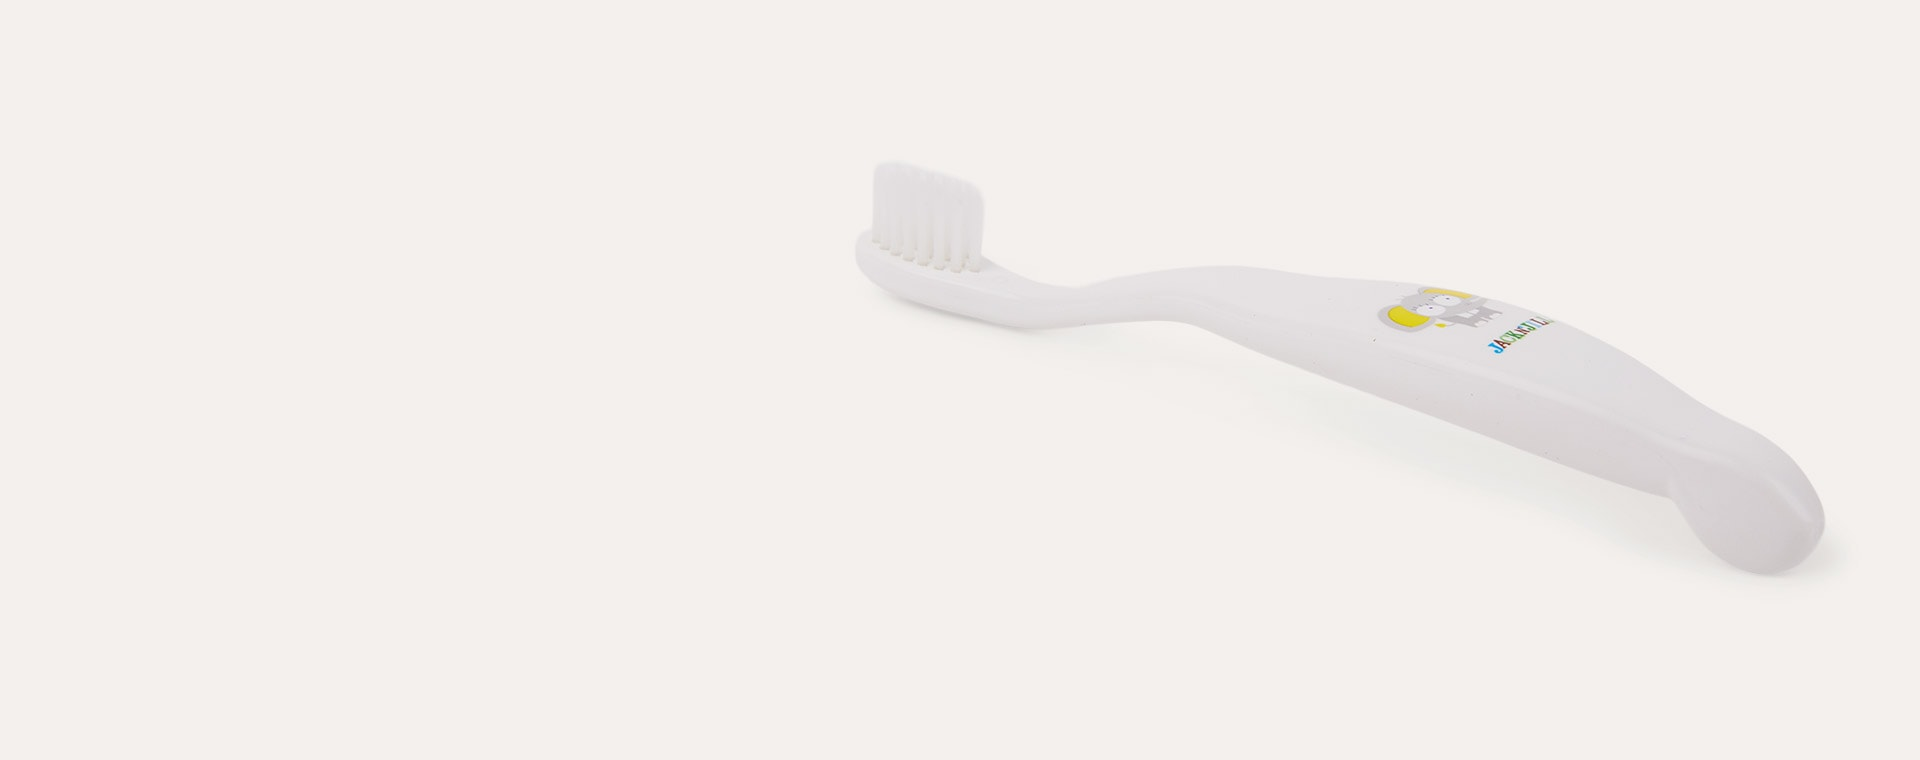 Elephant Jack N' Jill Biodegradable Toothbrush